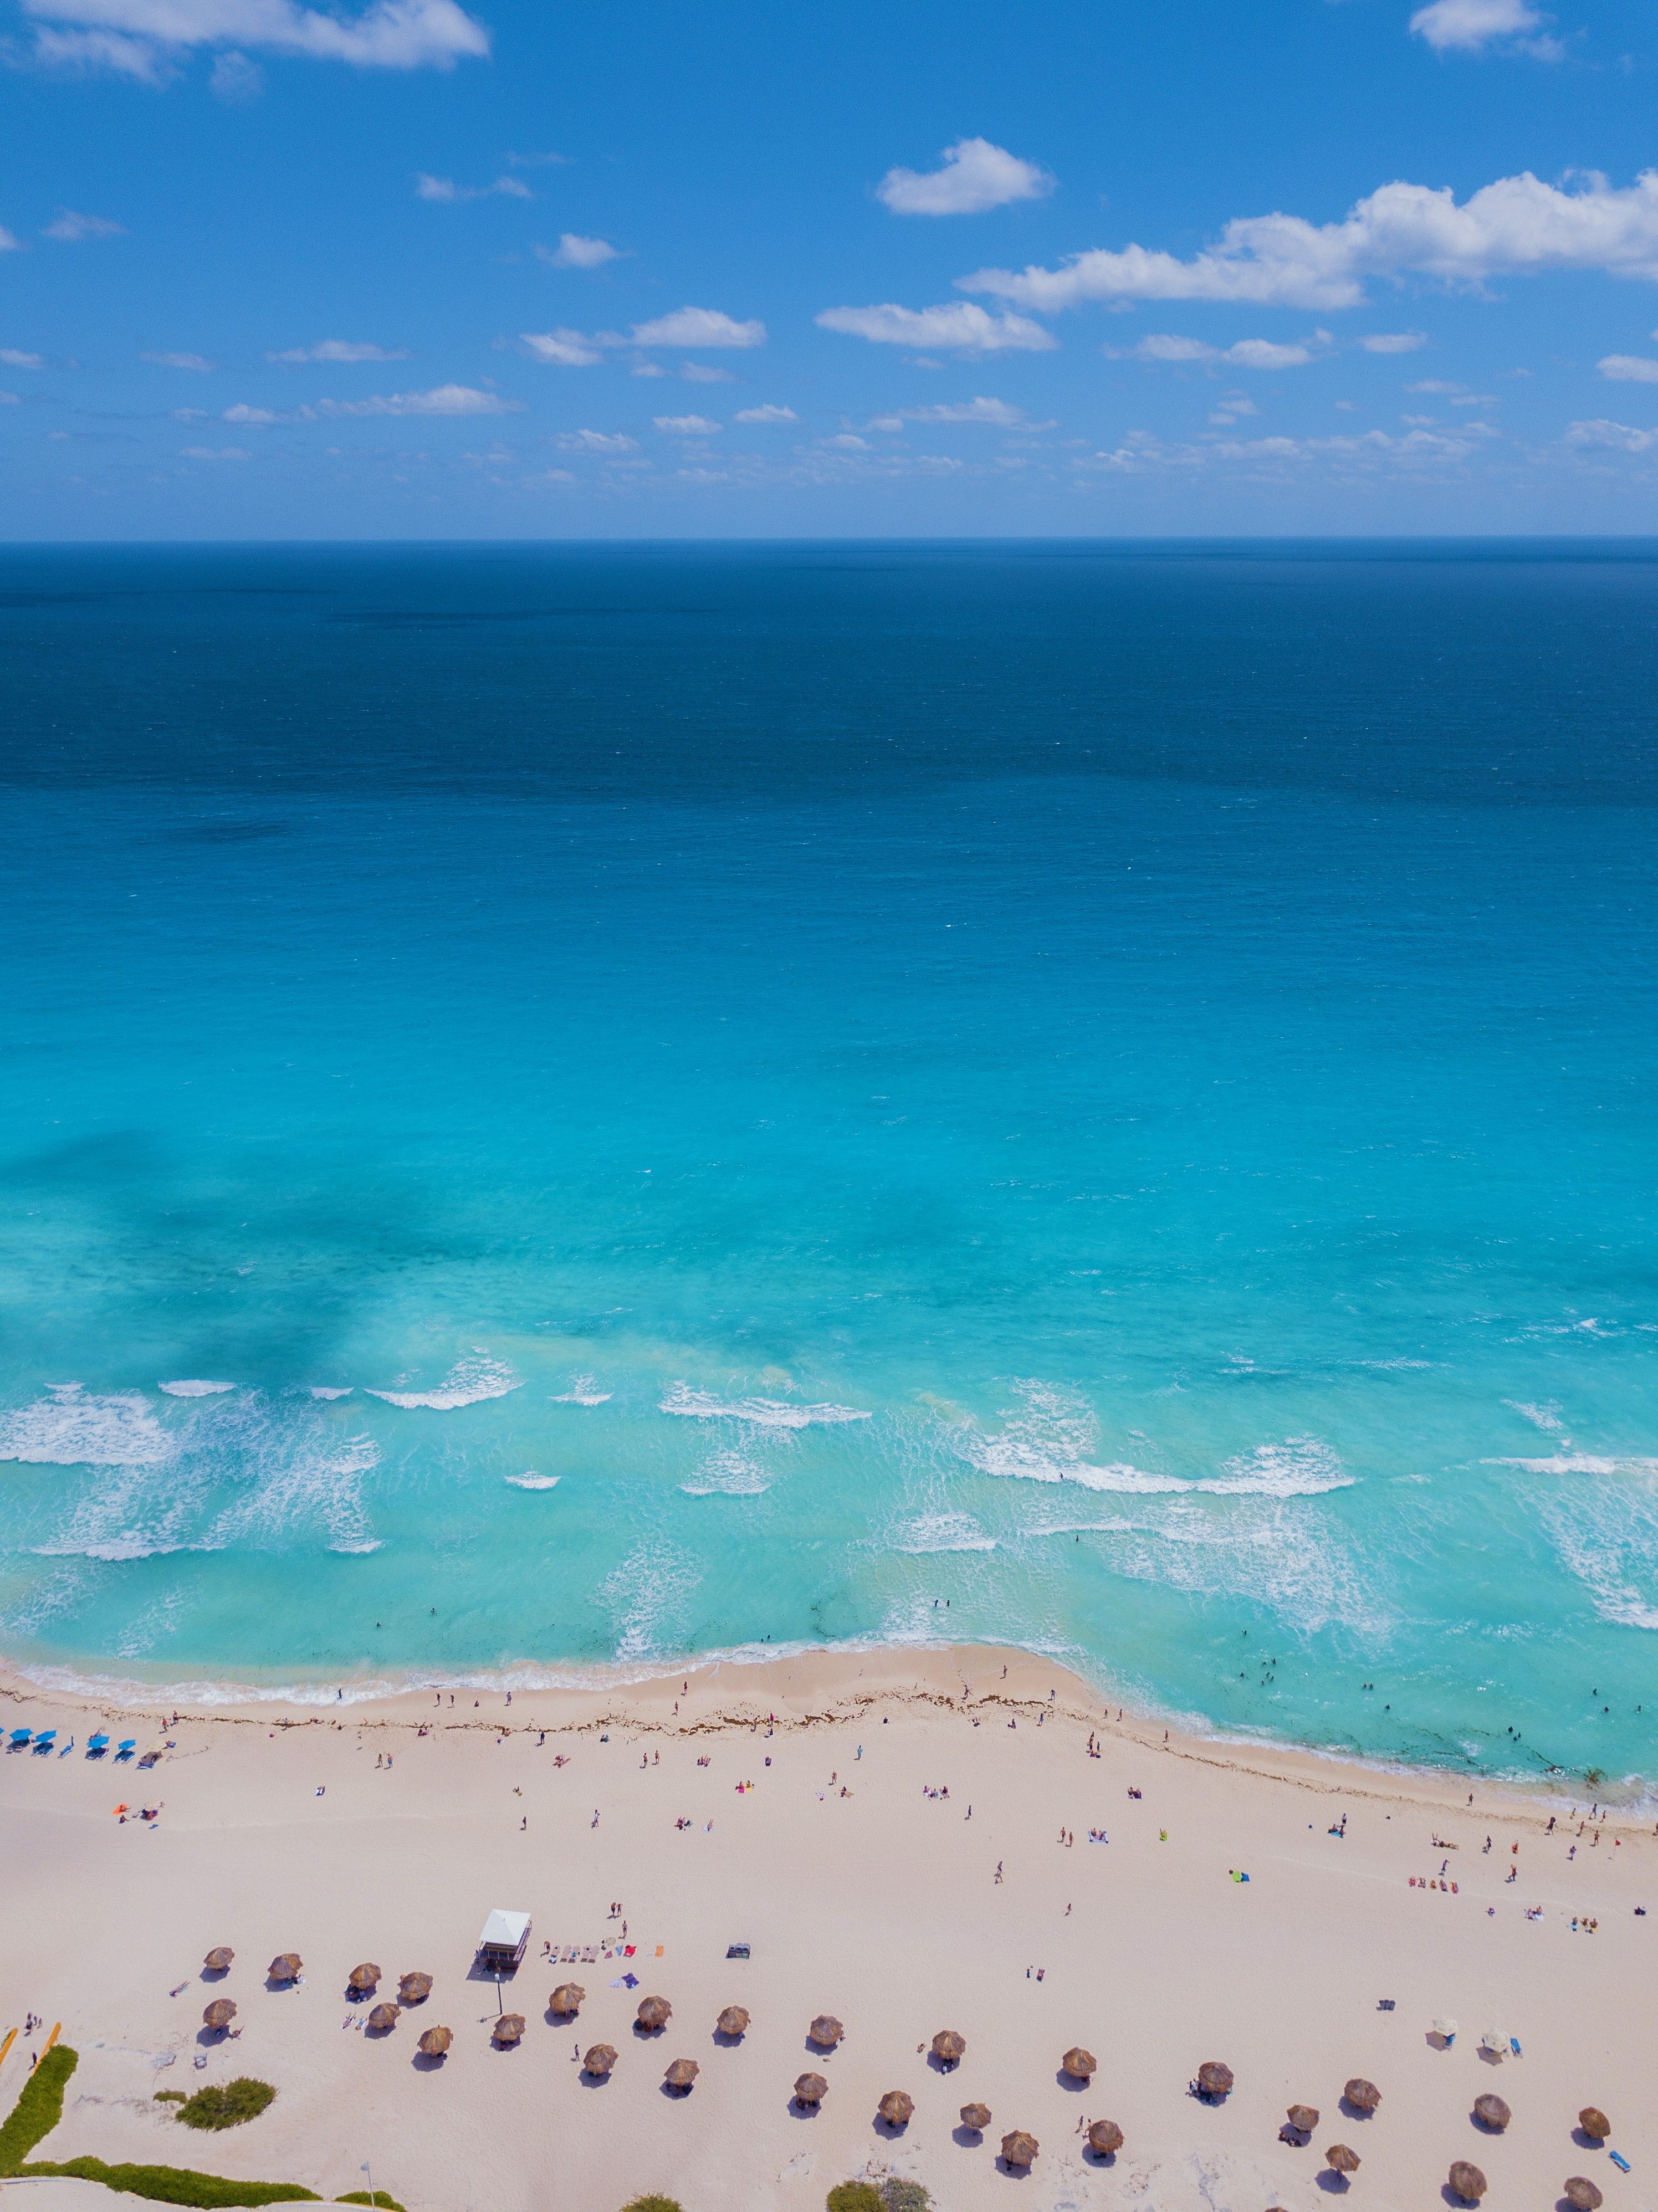 Dreams Of Teal Visit Cancun Most Beautiful Beaches Cancun Beaches